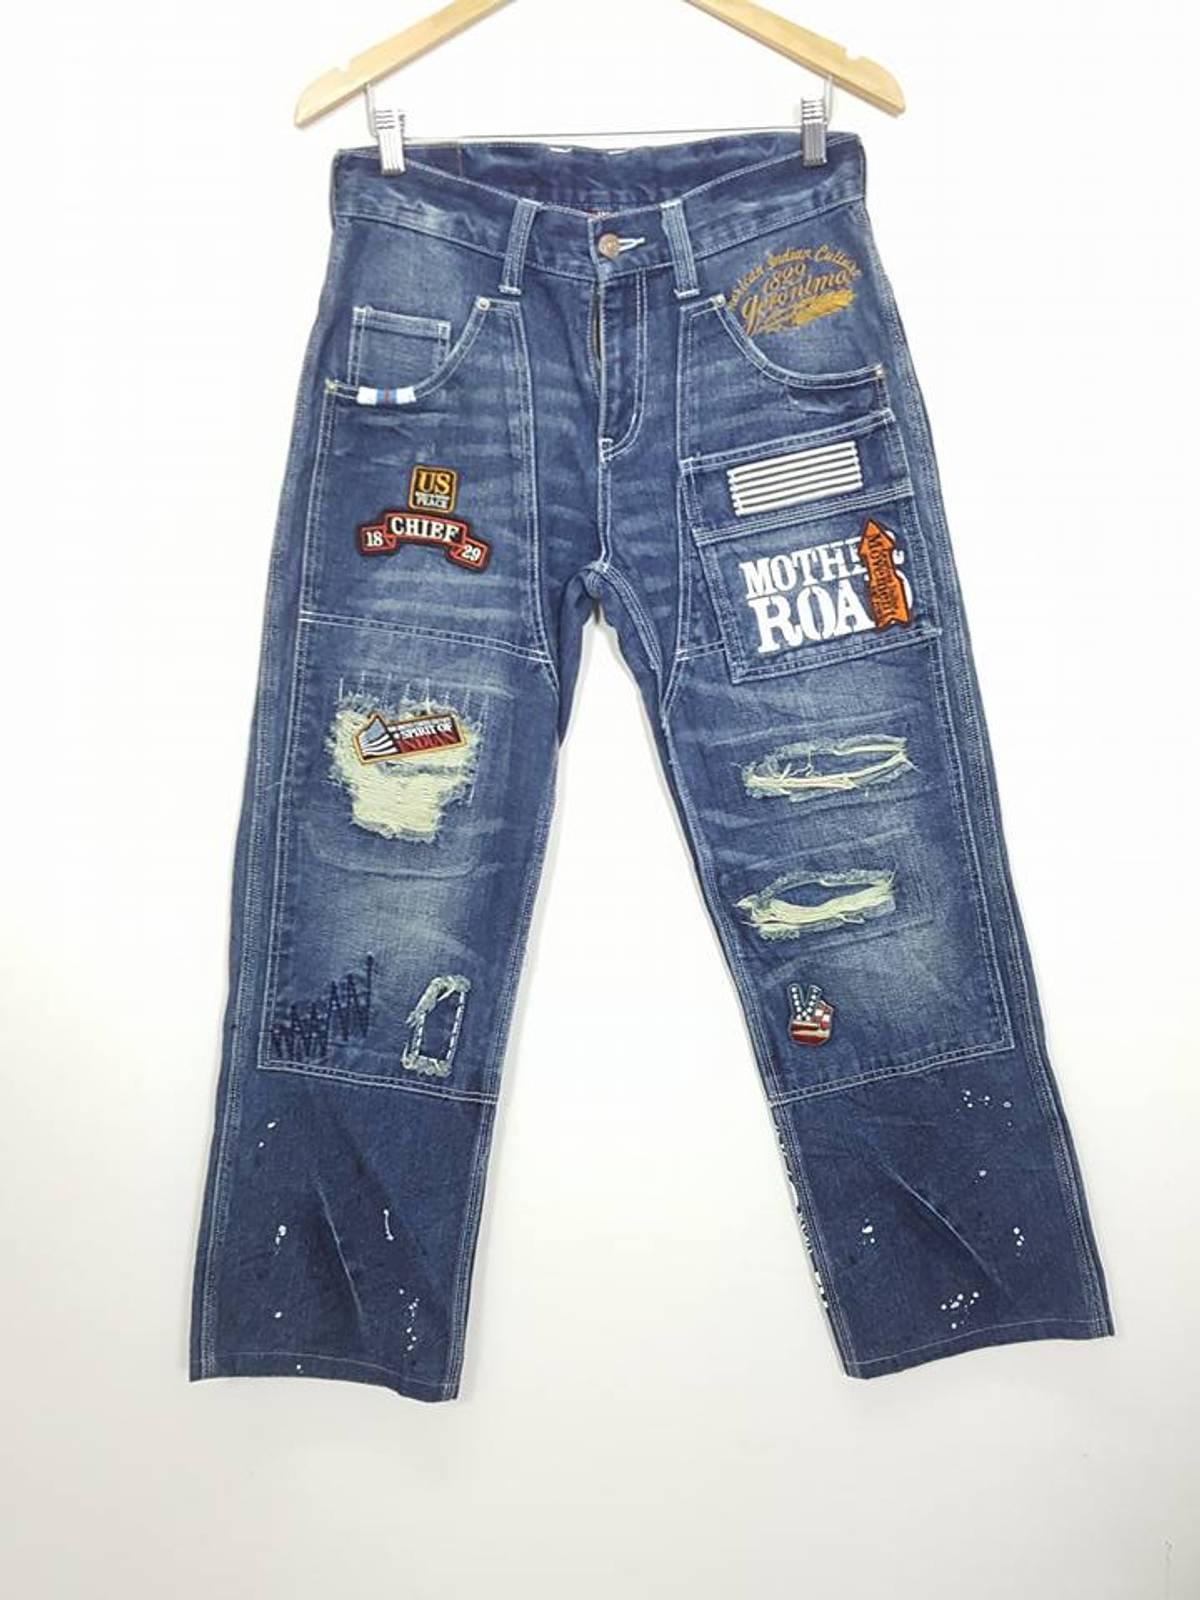 Patchwork Distressed Rugged Denim Jeans